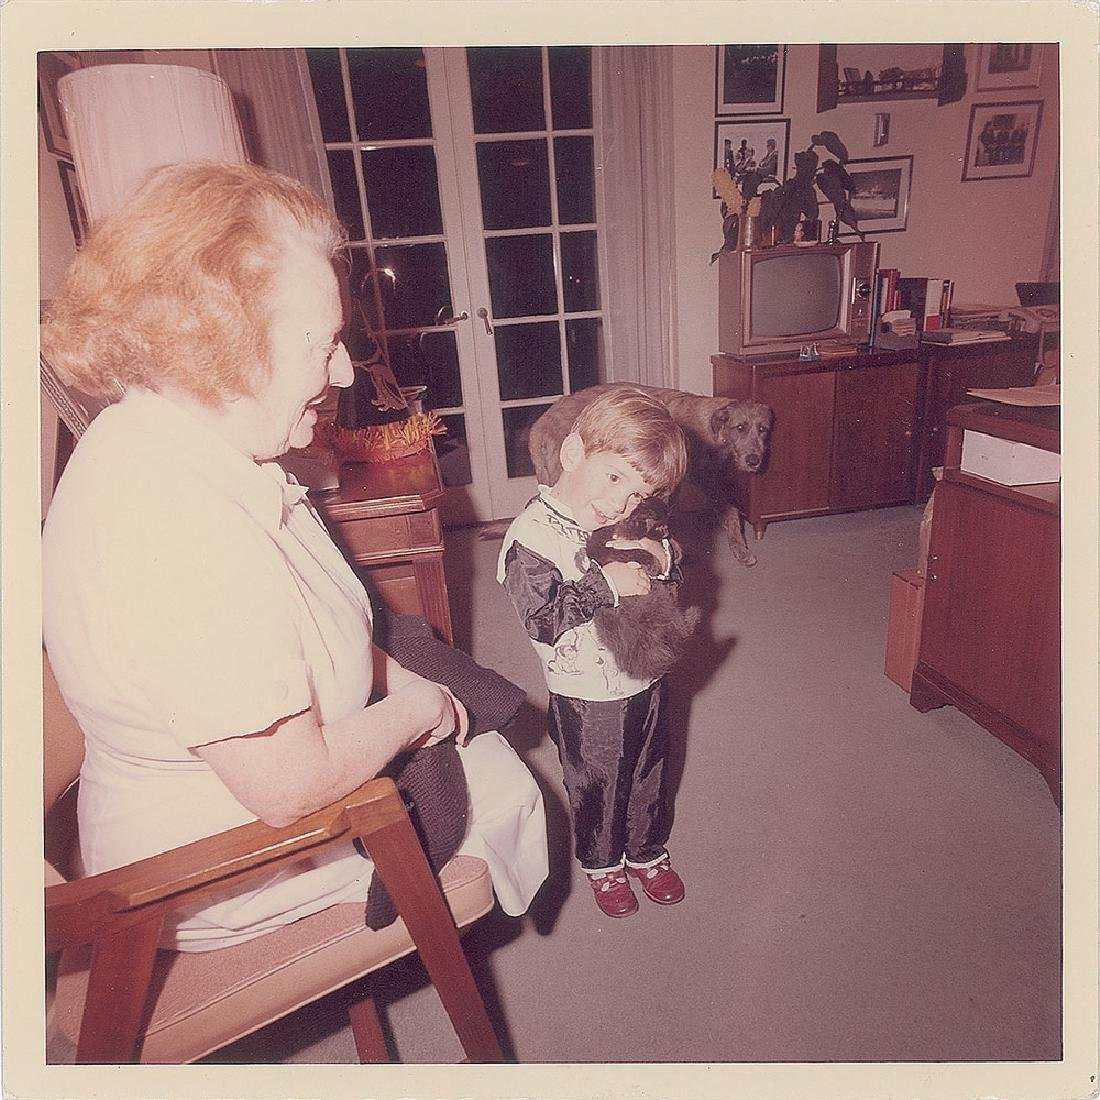 John F. Kennedy, Jr. Original Vintage Photograph by Cecil Stoughton